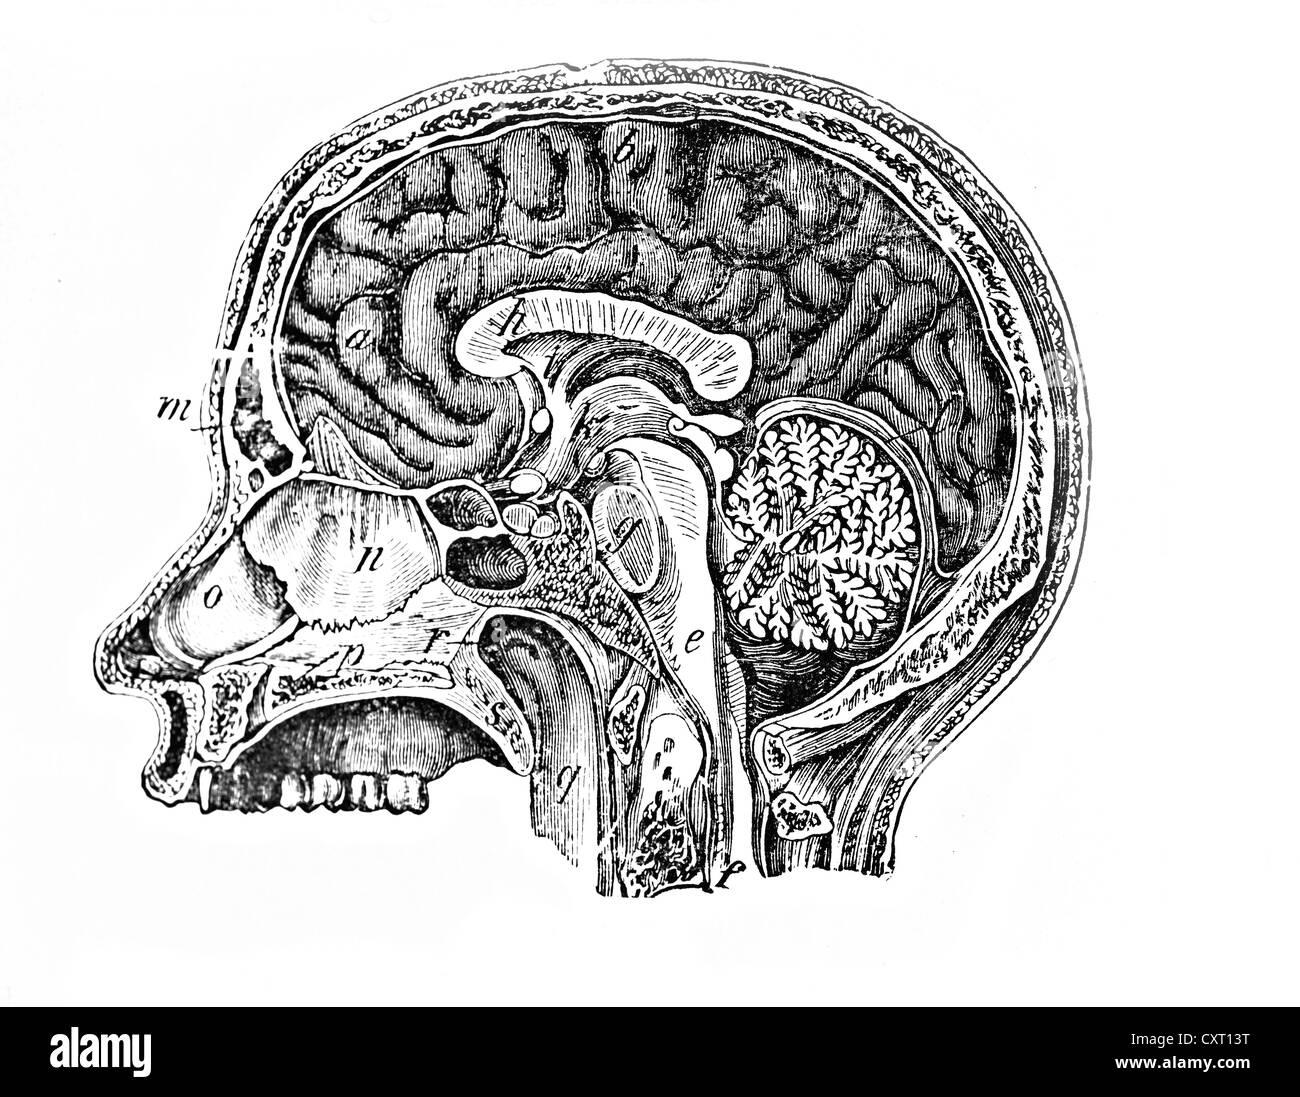 Longitudinal section of a human head, anatomical illustration - Stock Image